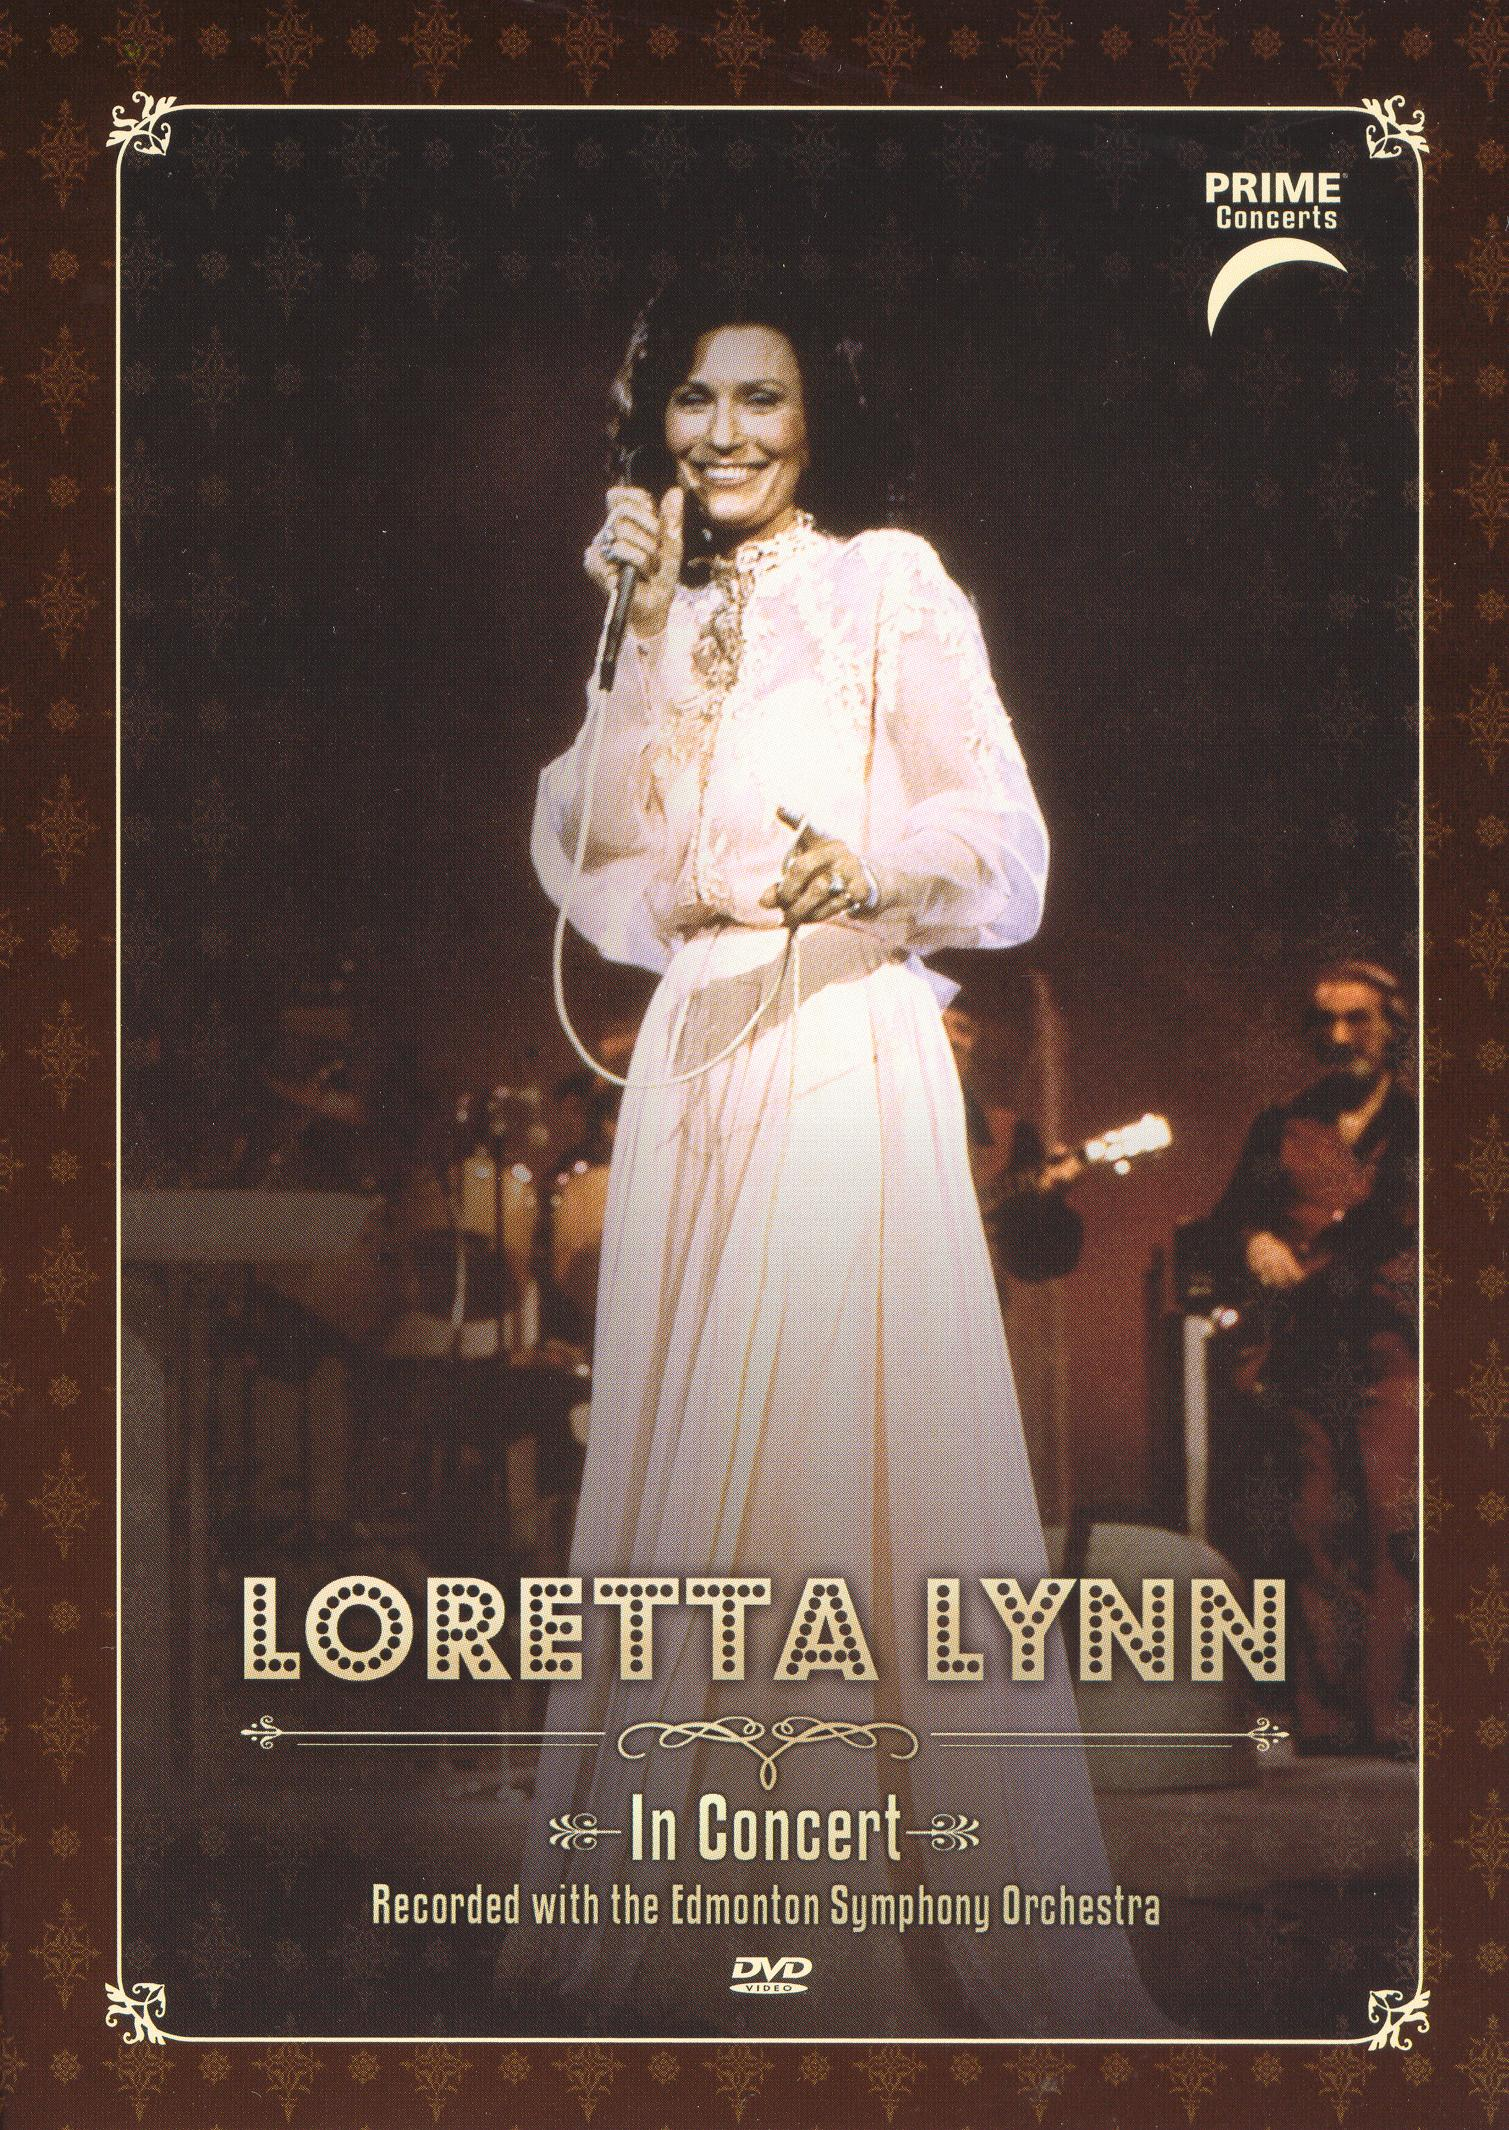 Loretta Lynn: Prime Concerts - In Concert with Edmonton Symphony